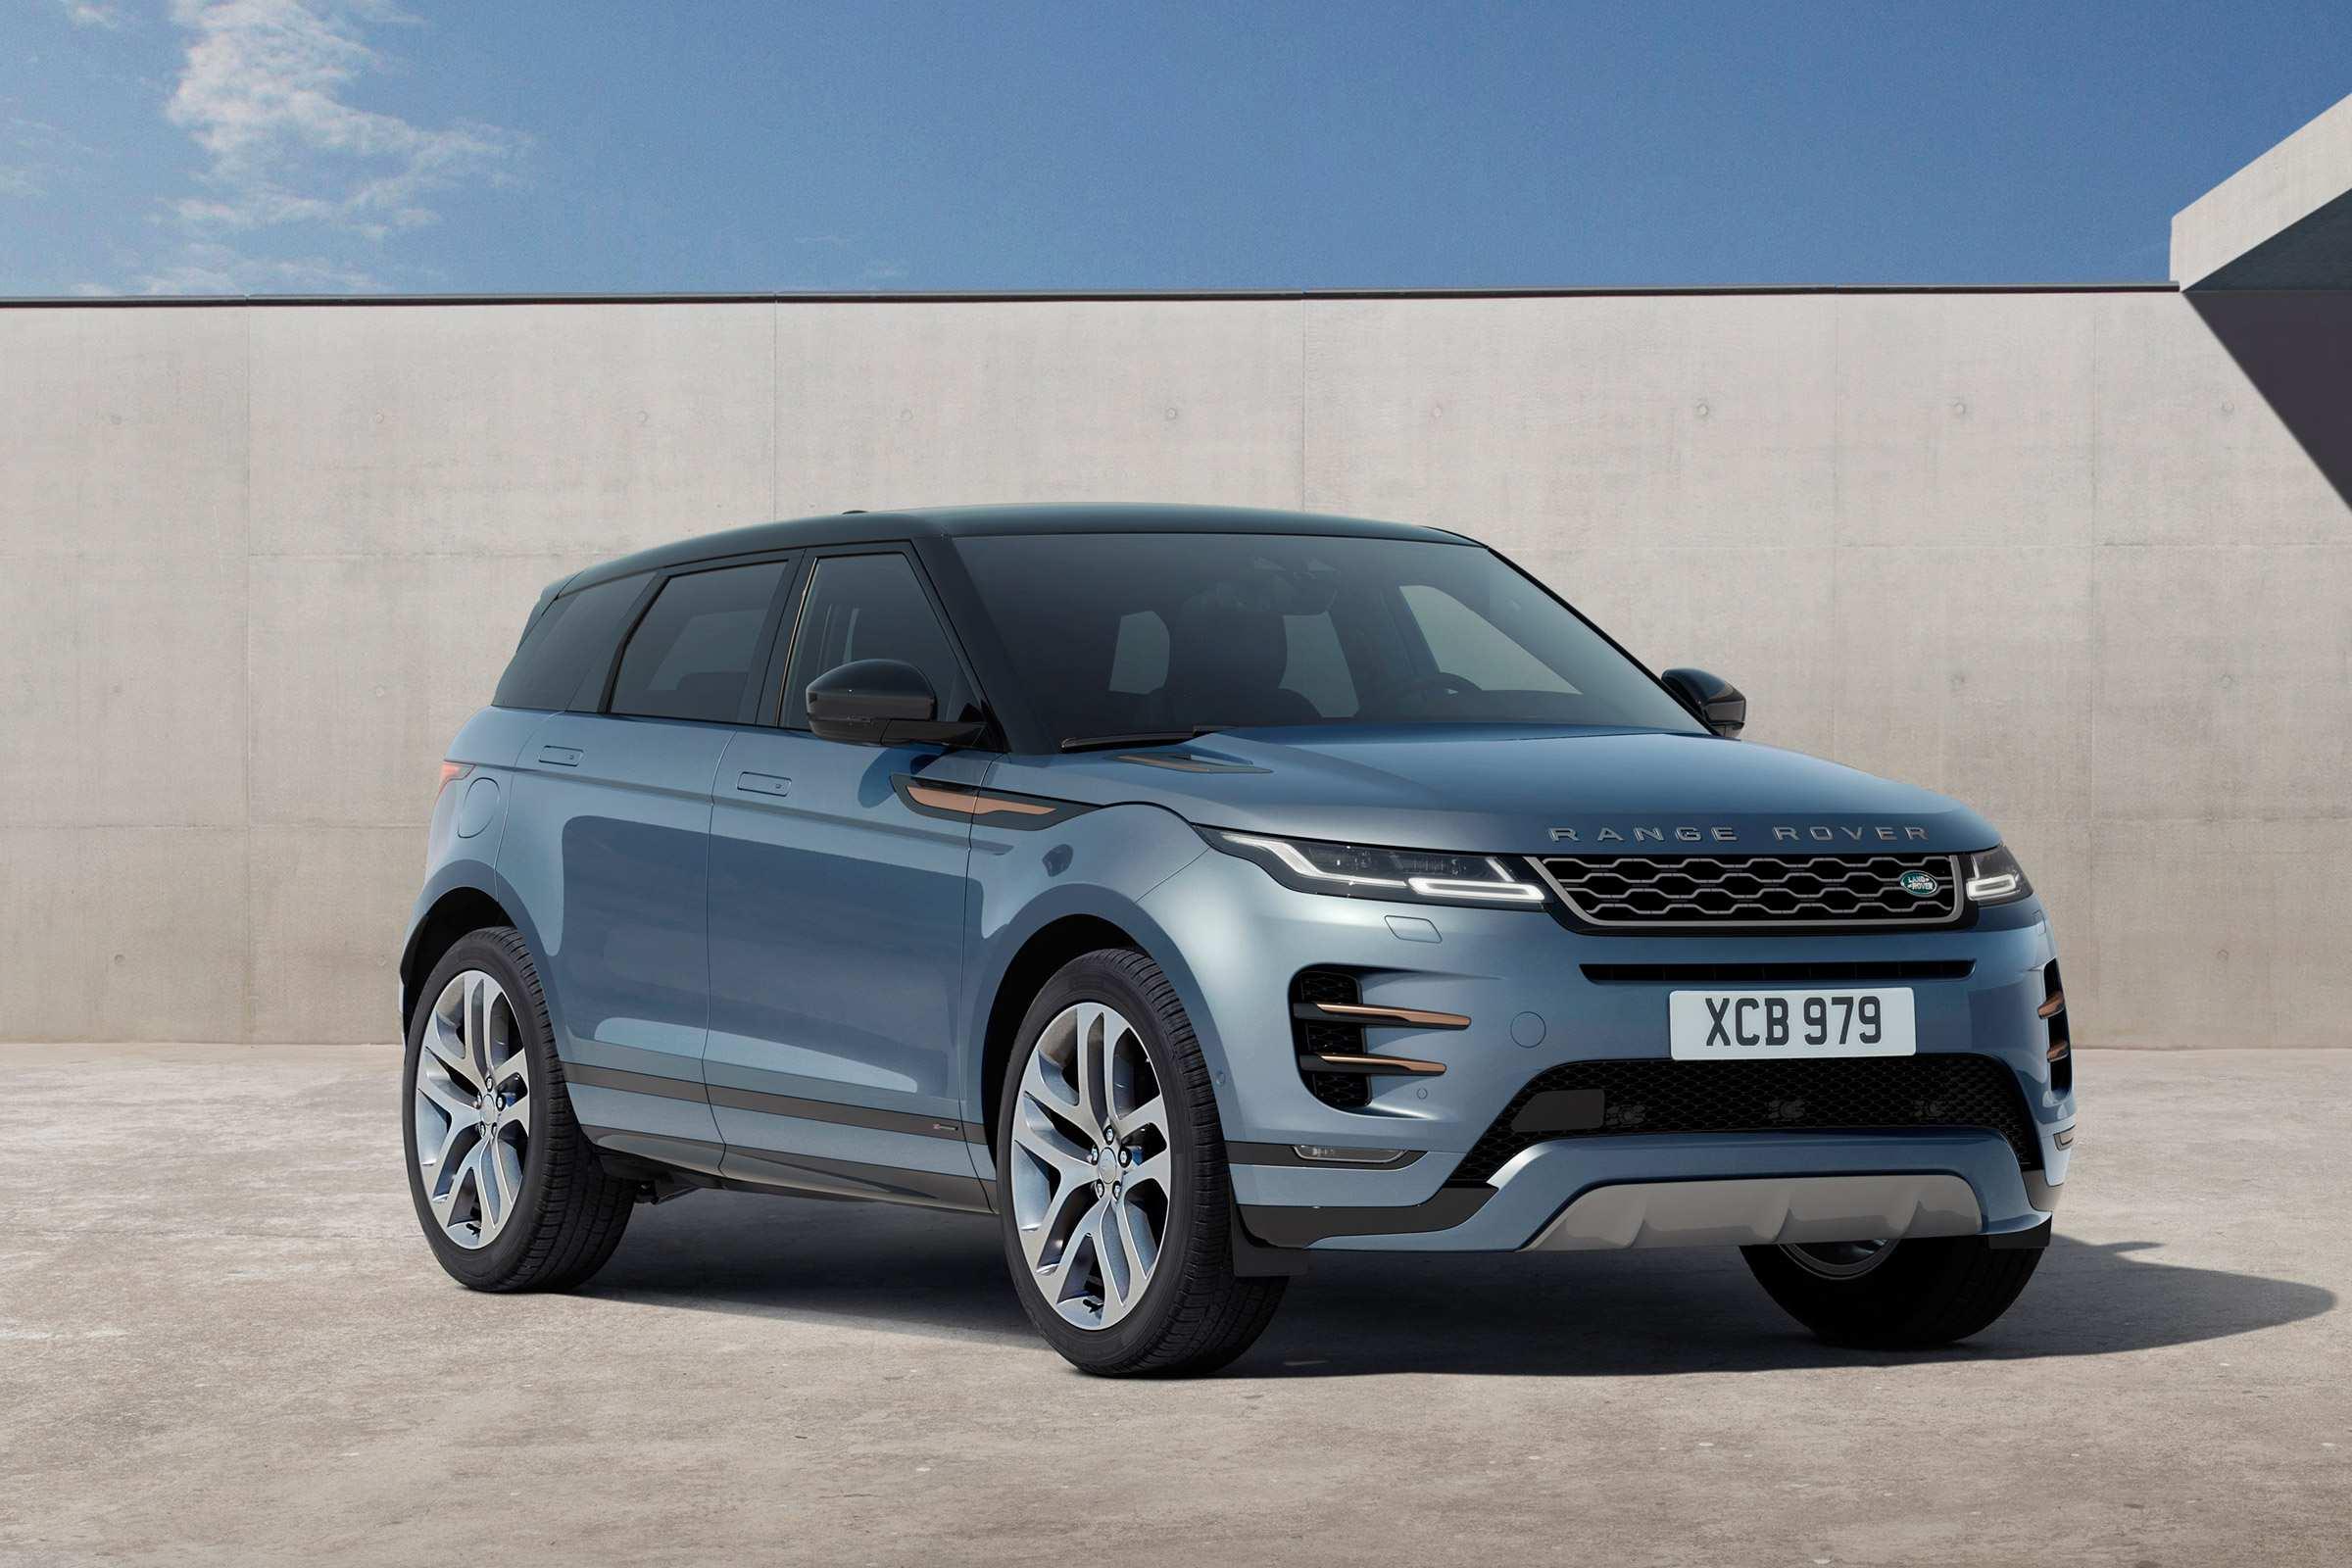 98 Gallery of 2020 Range Rover Evoque Xl Interior by 2020 Range Rover Evoque Xl